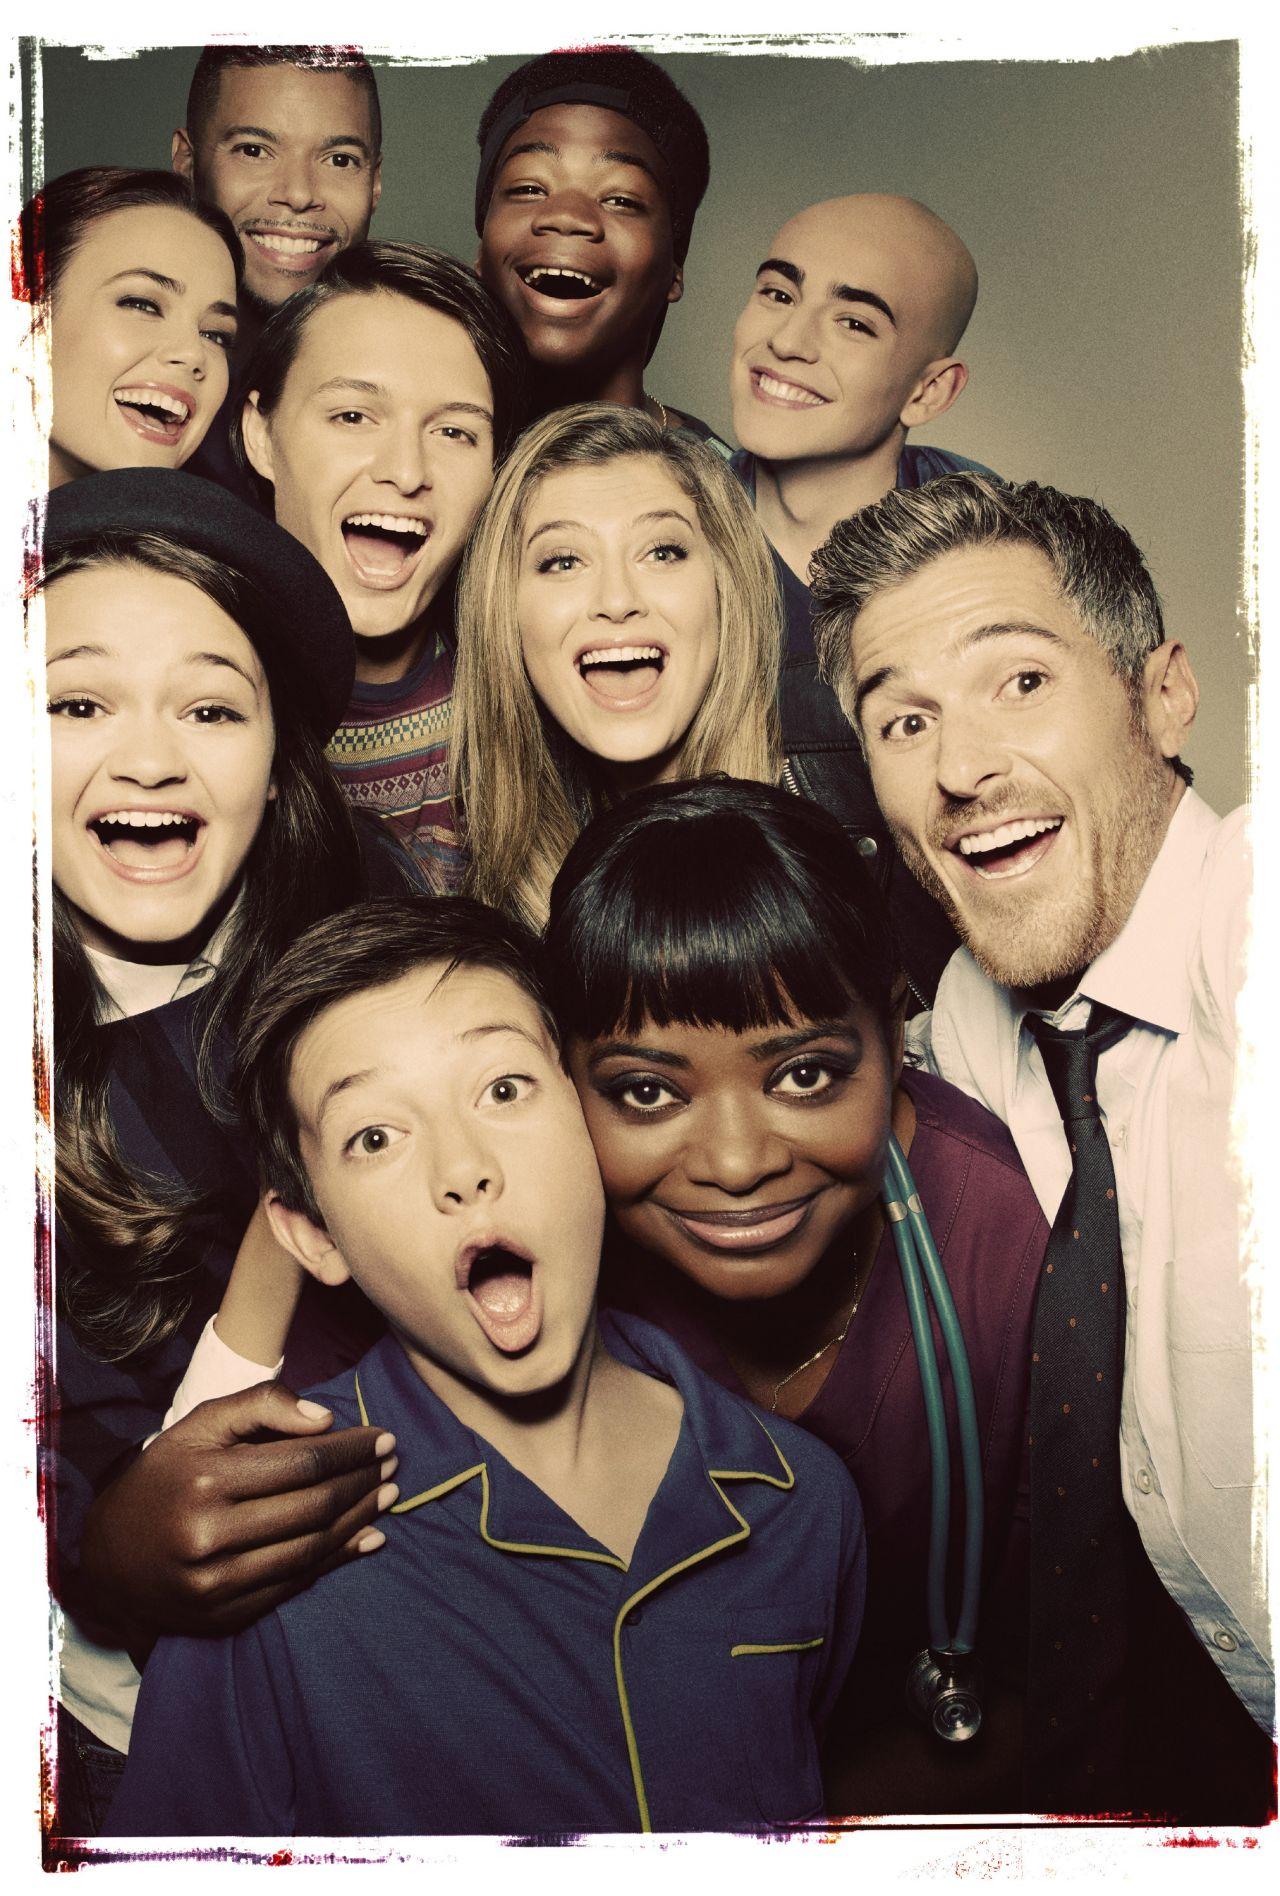 Bravo red band society television series season 1 promos